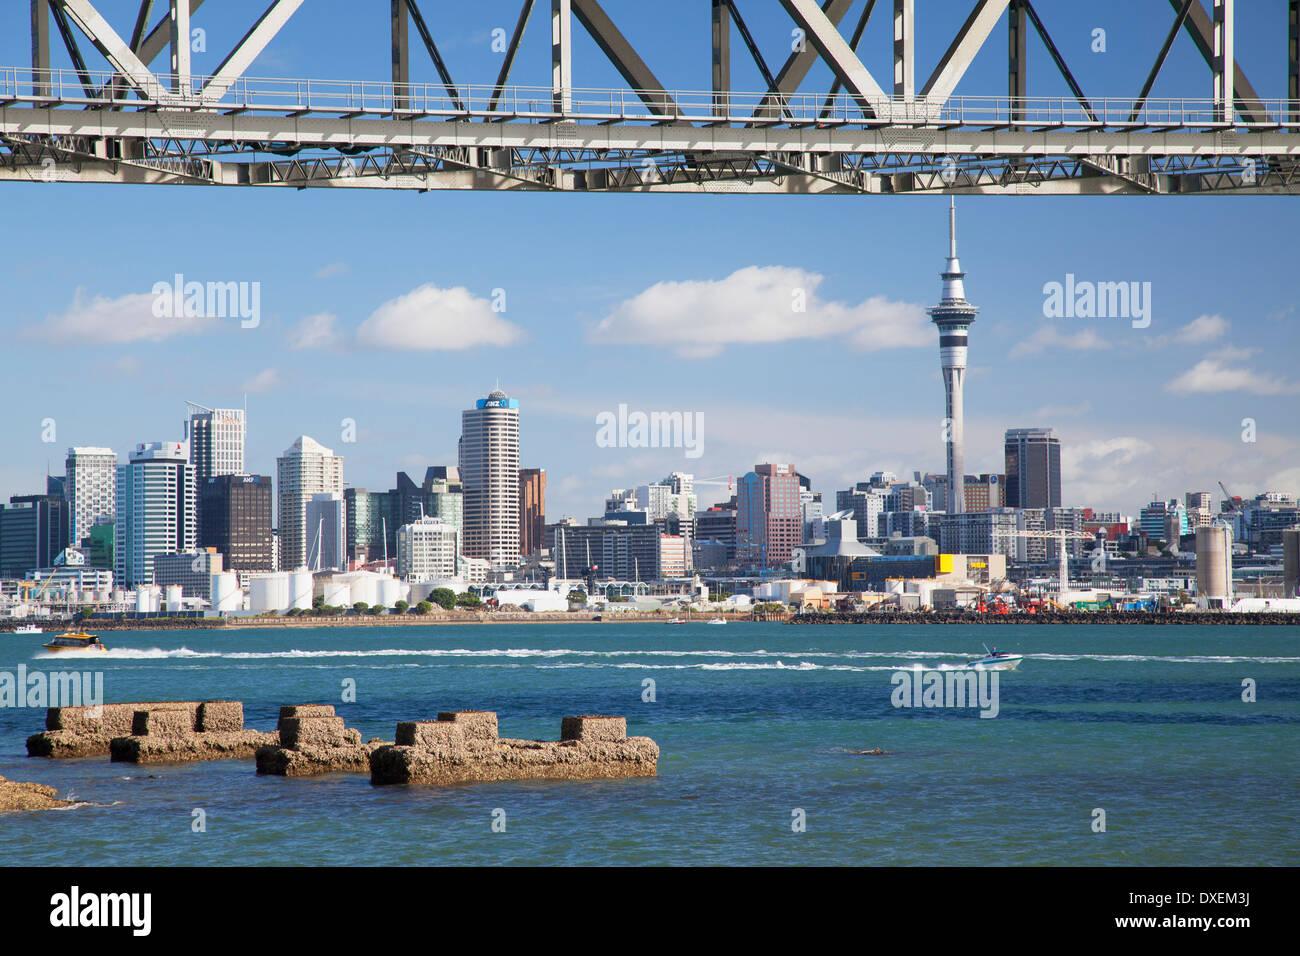 Auckland Harbour Bridge and city skyline, Auckland, North Island, New Zealand - Stock Image